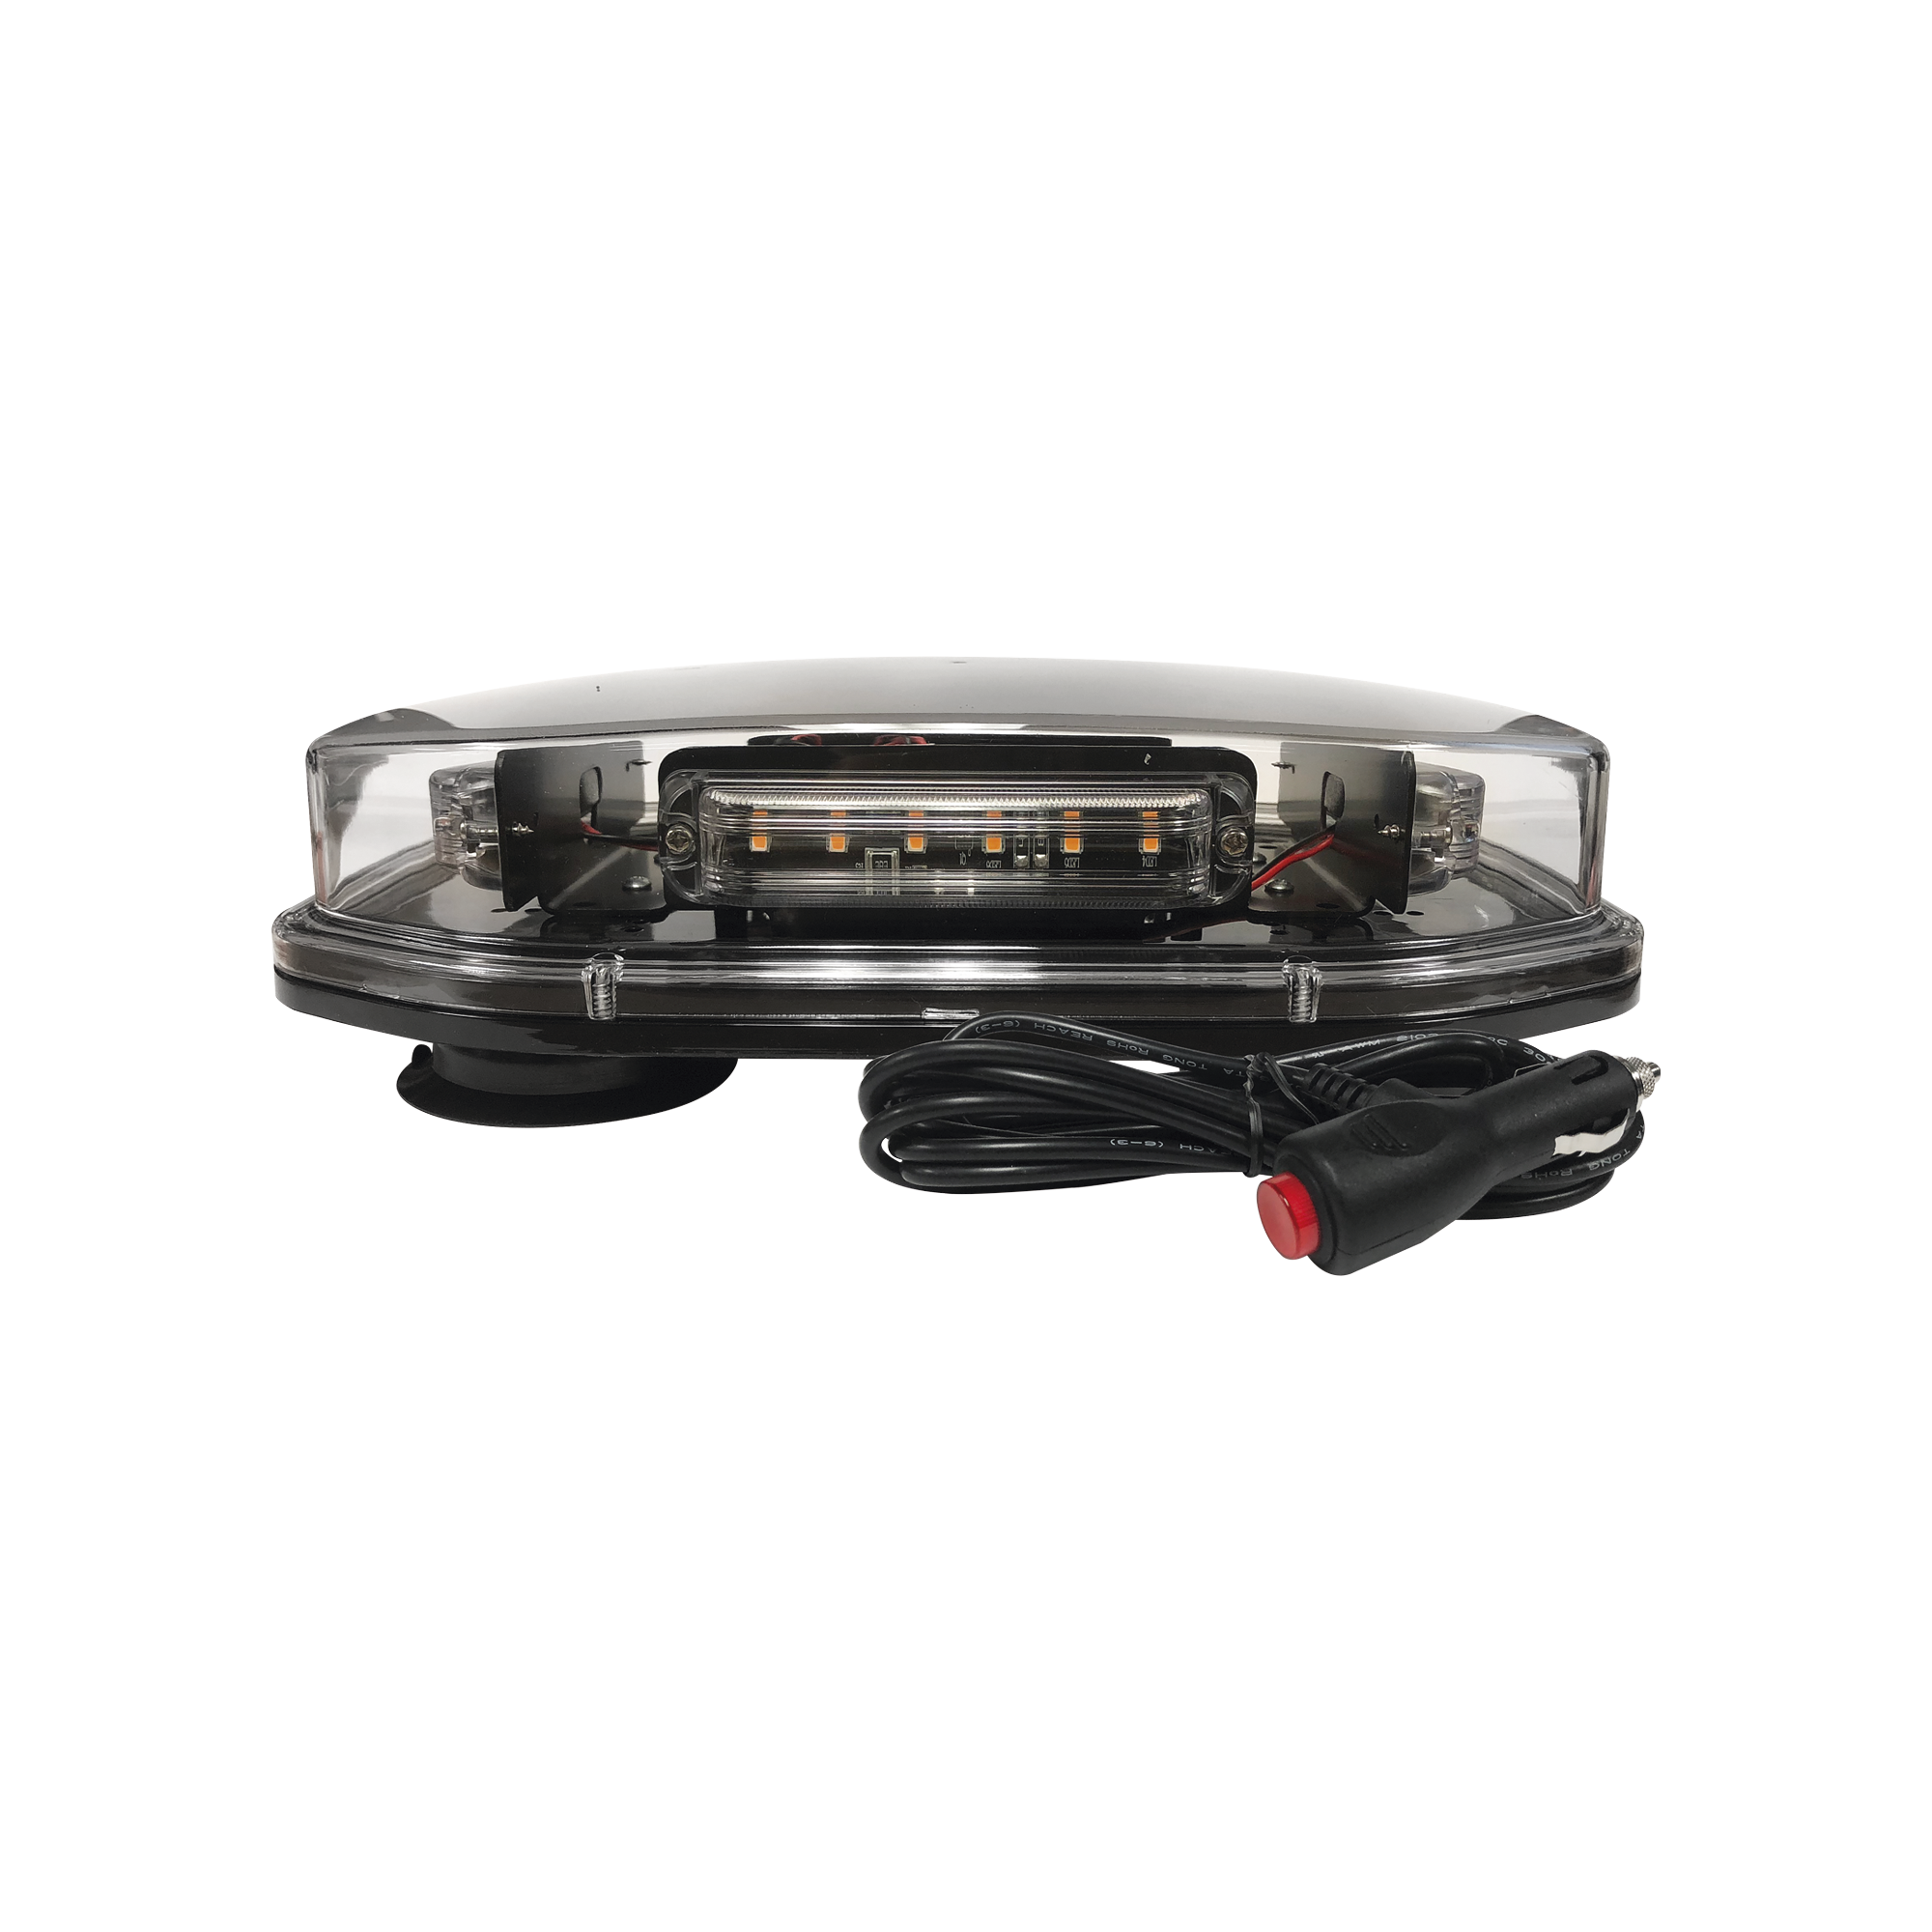 Mini barra de luces estroboscopica, color ambar, montaje magnetico, 12 VCD,